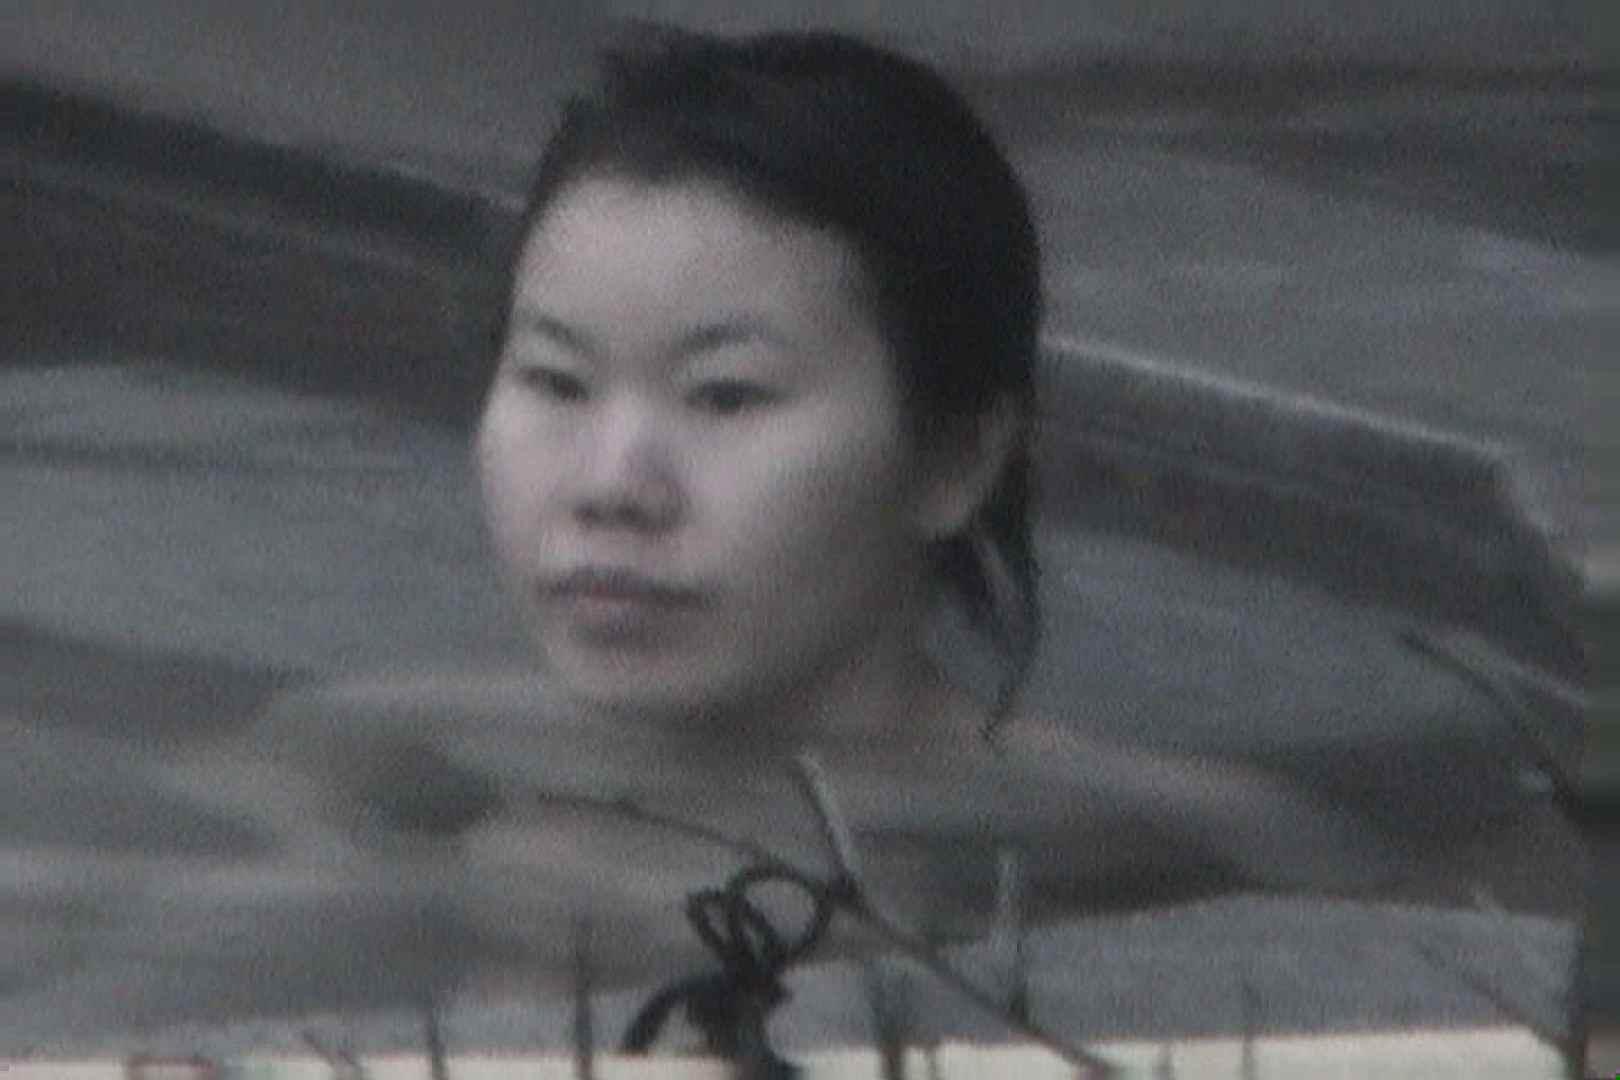 Aquaな露天風呂Vol.556 美しいOLの裸体 すけべAV動画紹介 69pic 17